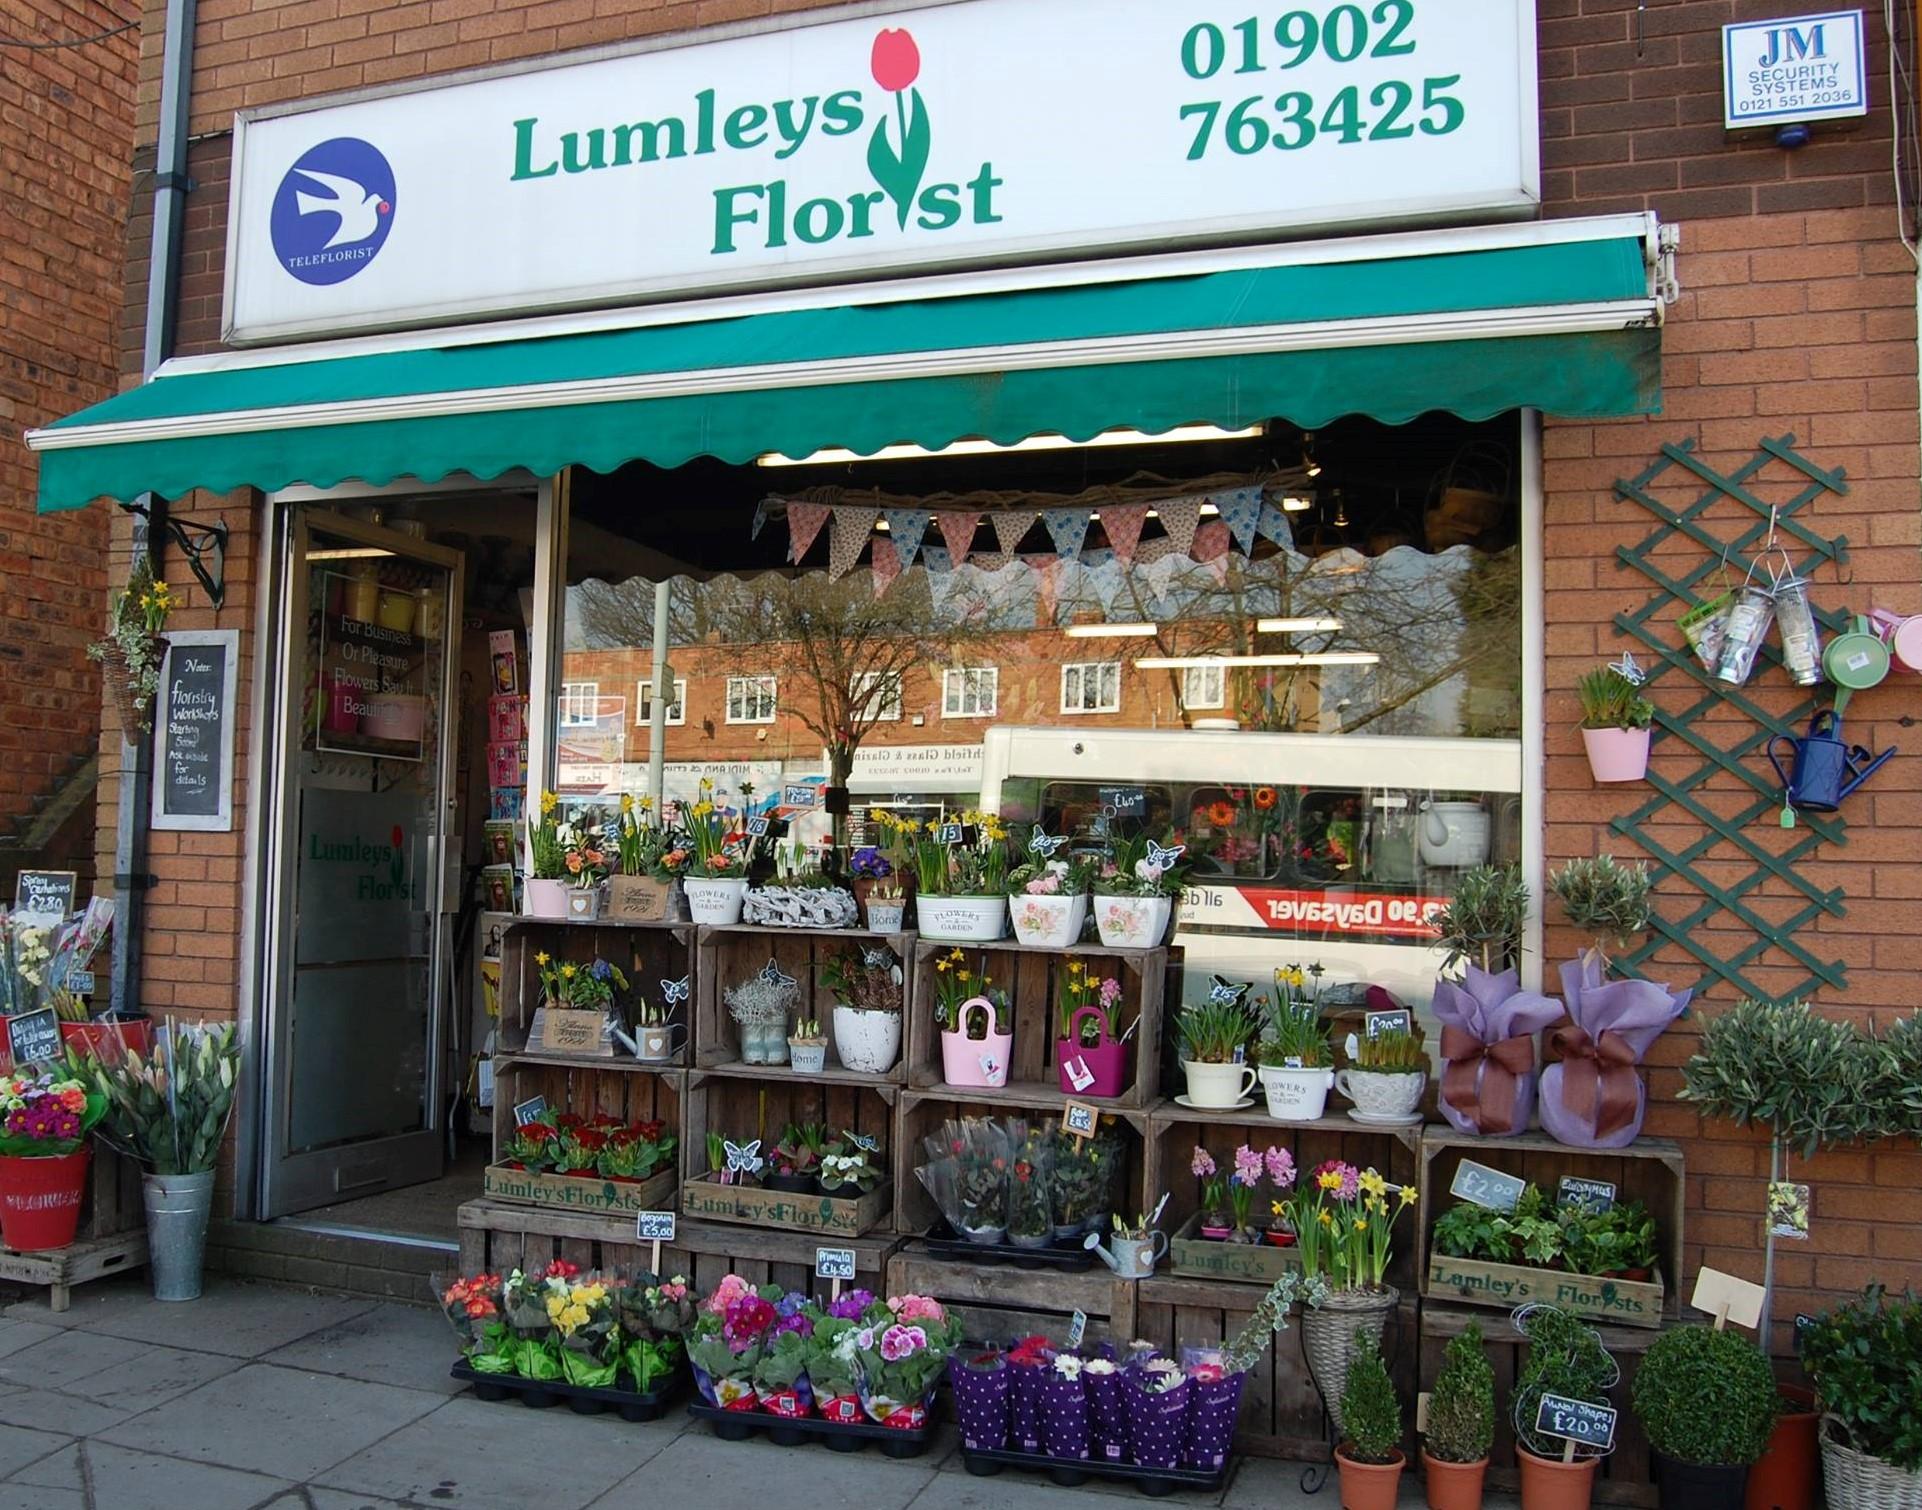 Lumleys Florist